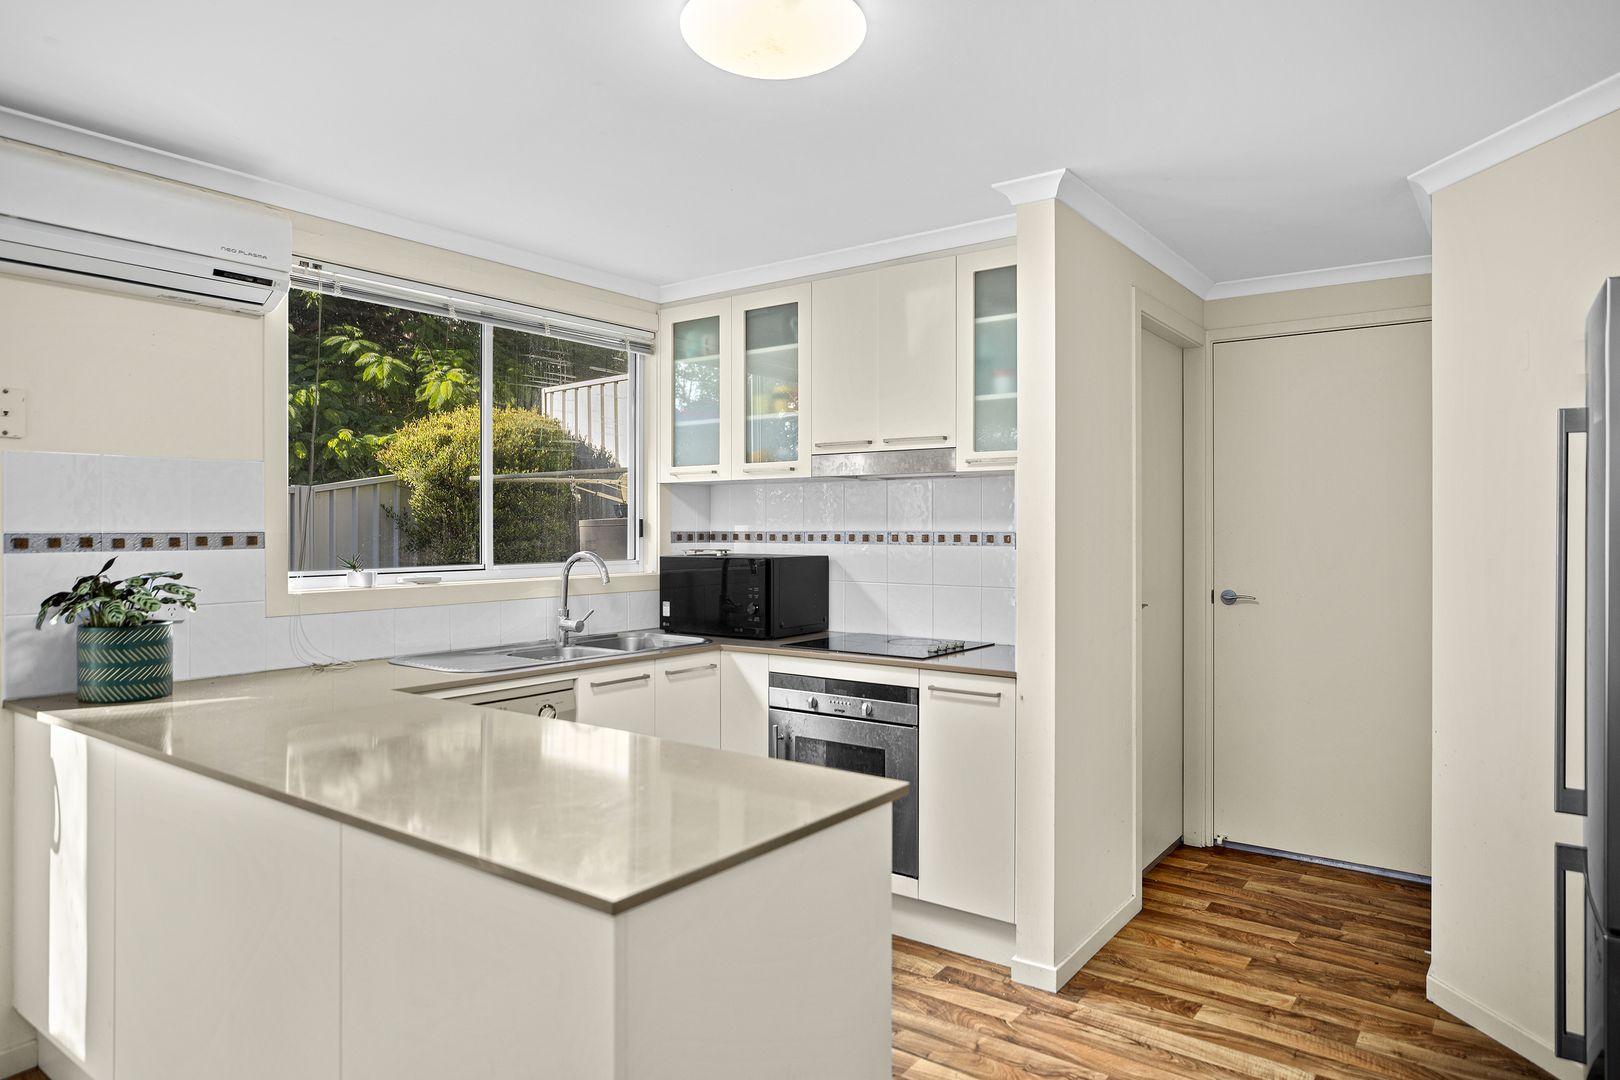 8/22 Parkes Street, Nambucca Heads NSW 2448, Image 1